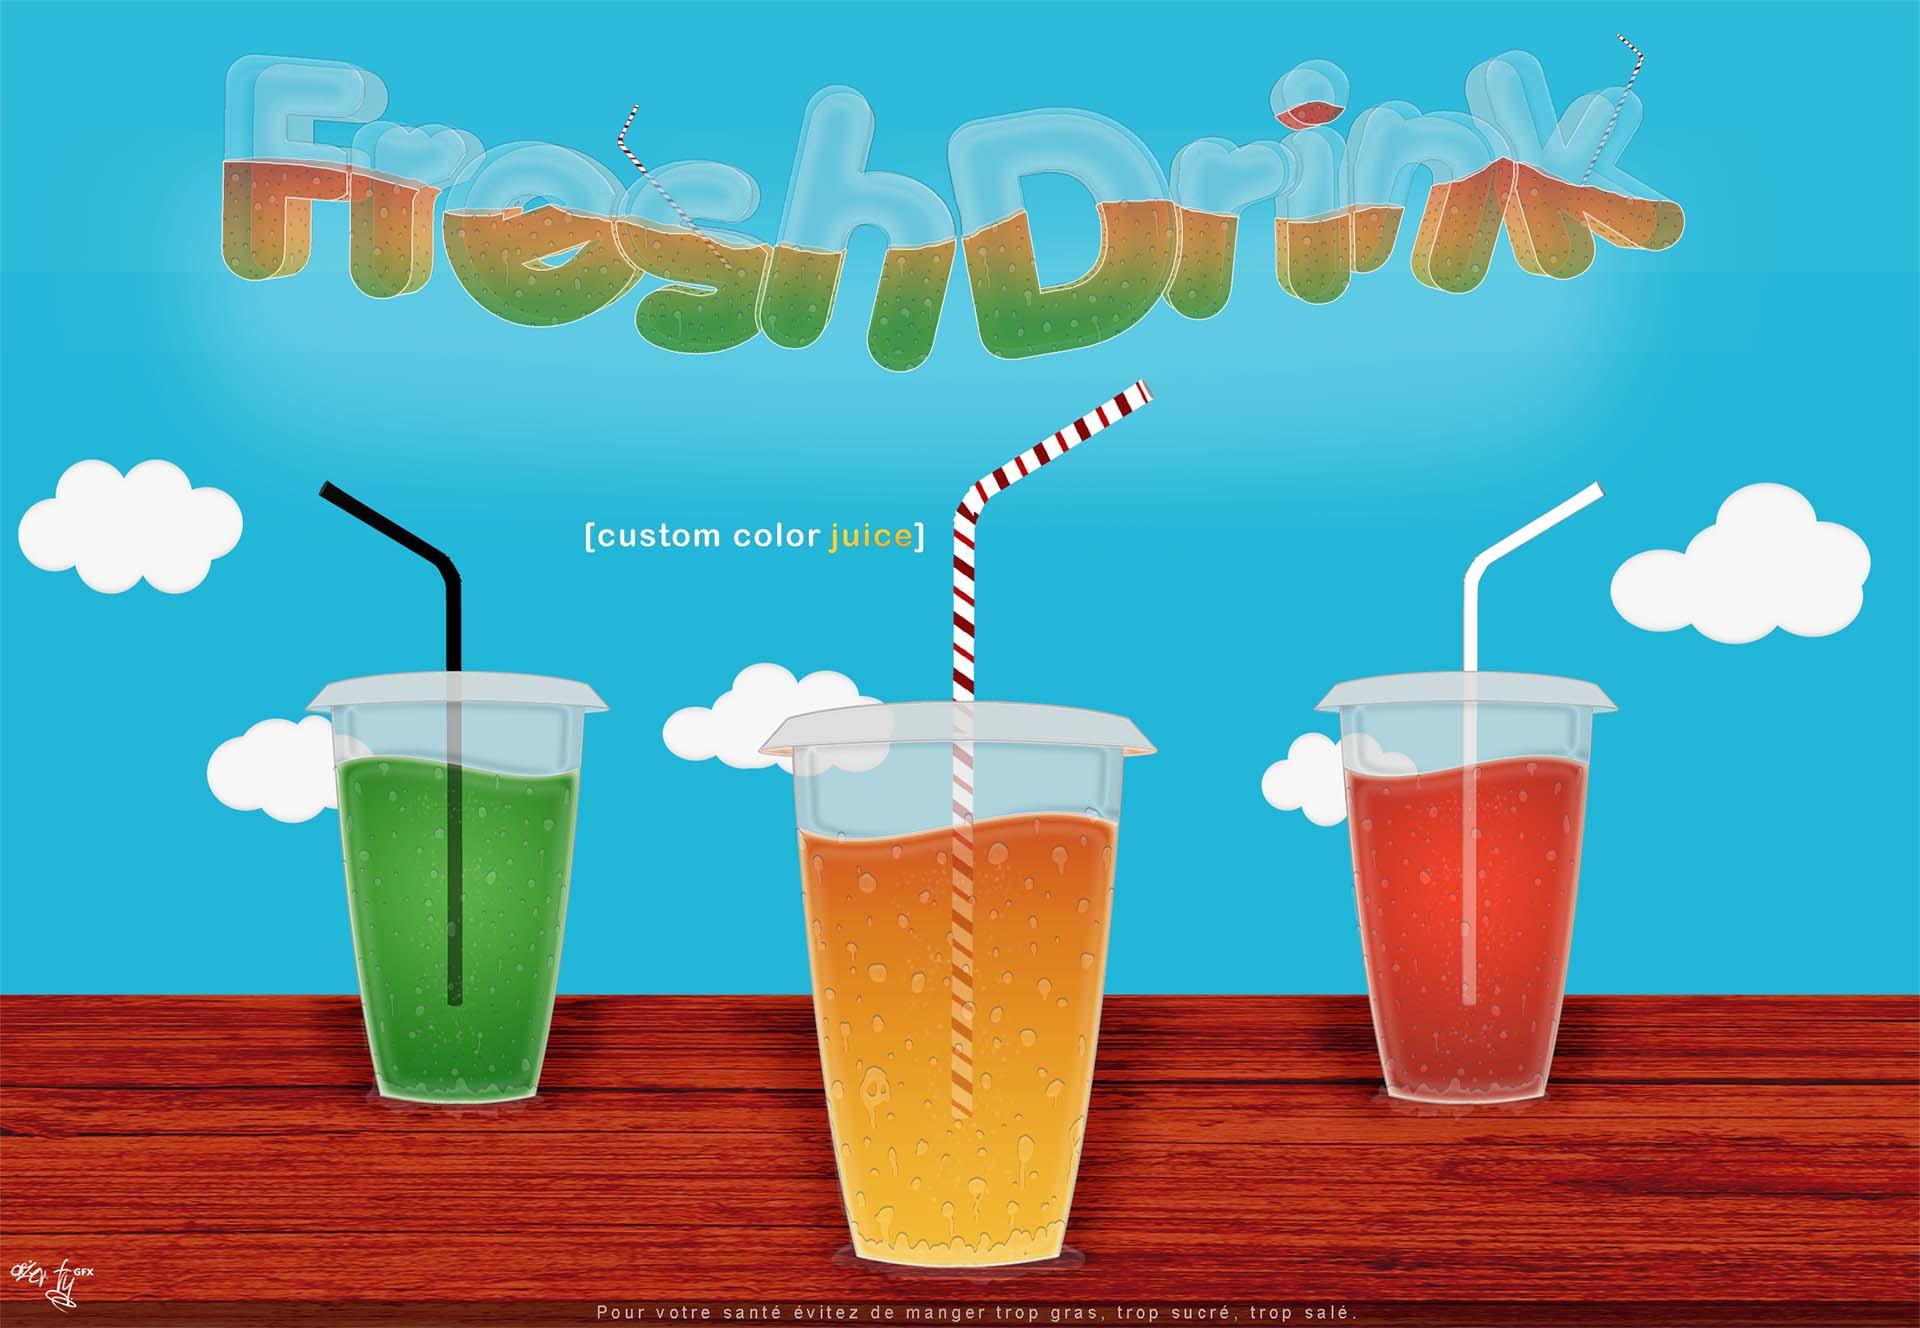 Illustration Freshdrink Affiche Publicitaire